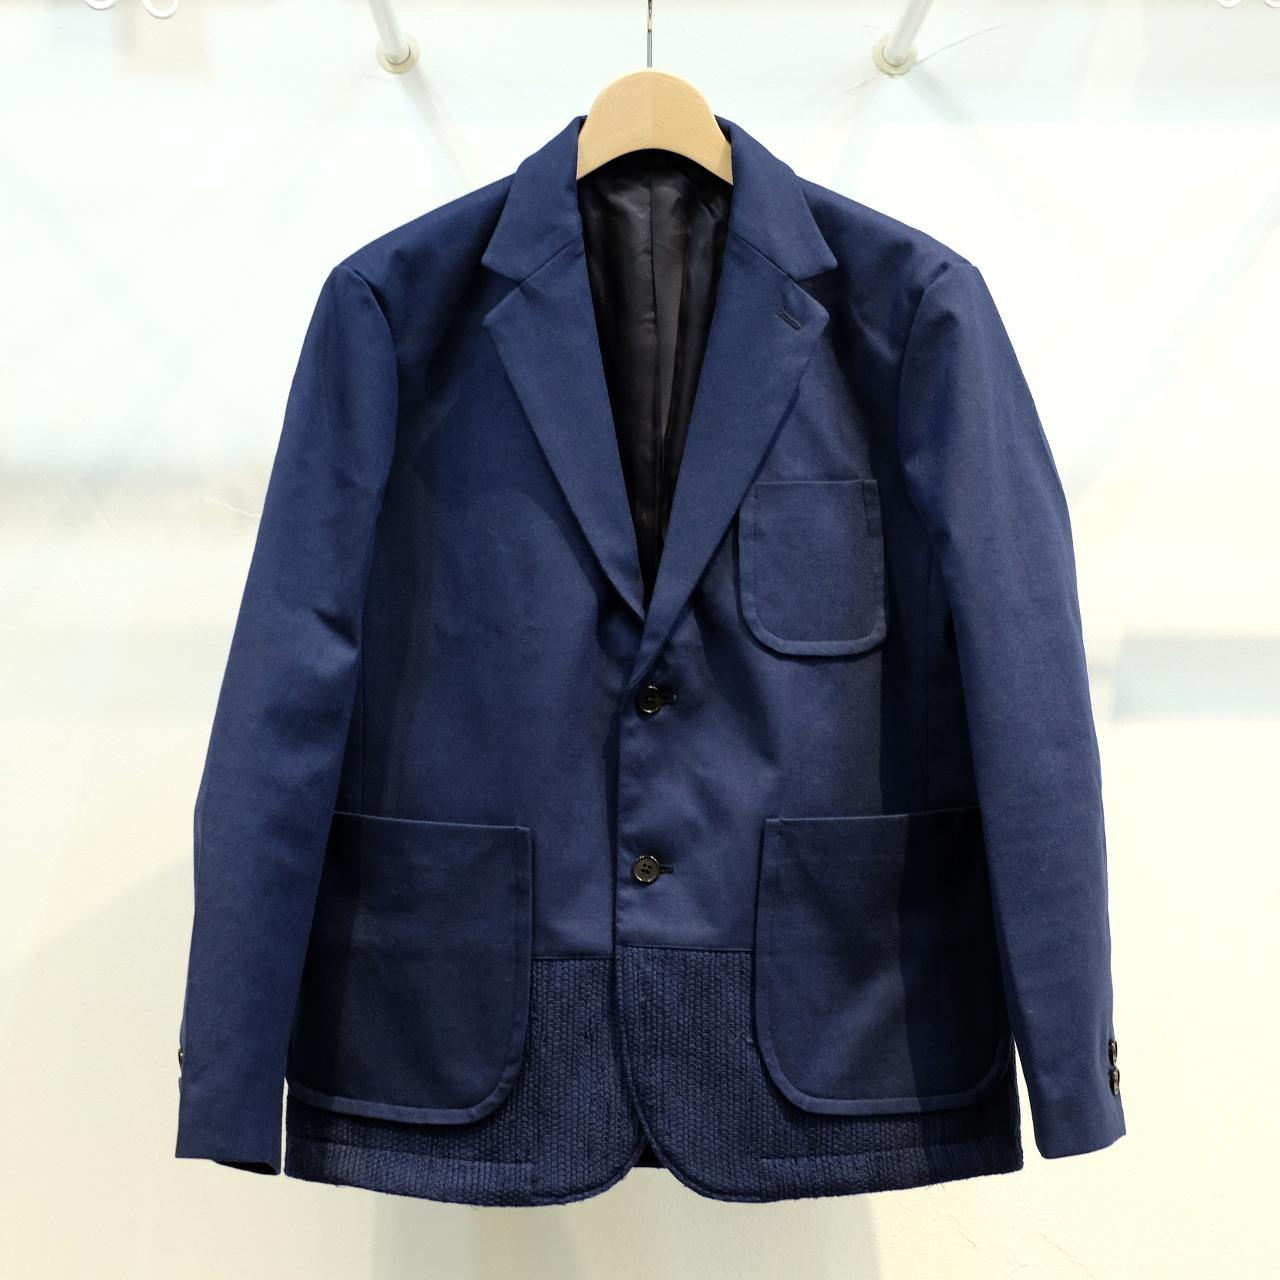 KUON(クオン) 裂織り切り替え ウールボンディングジャケット ネイビー